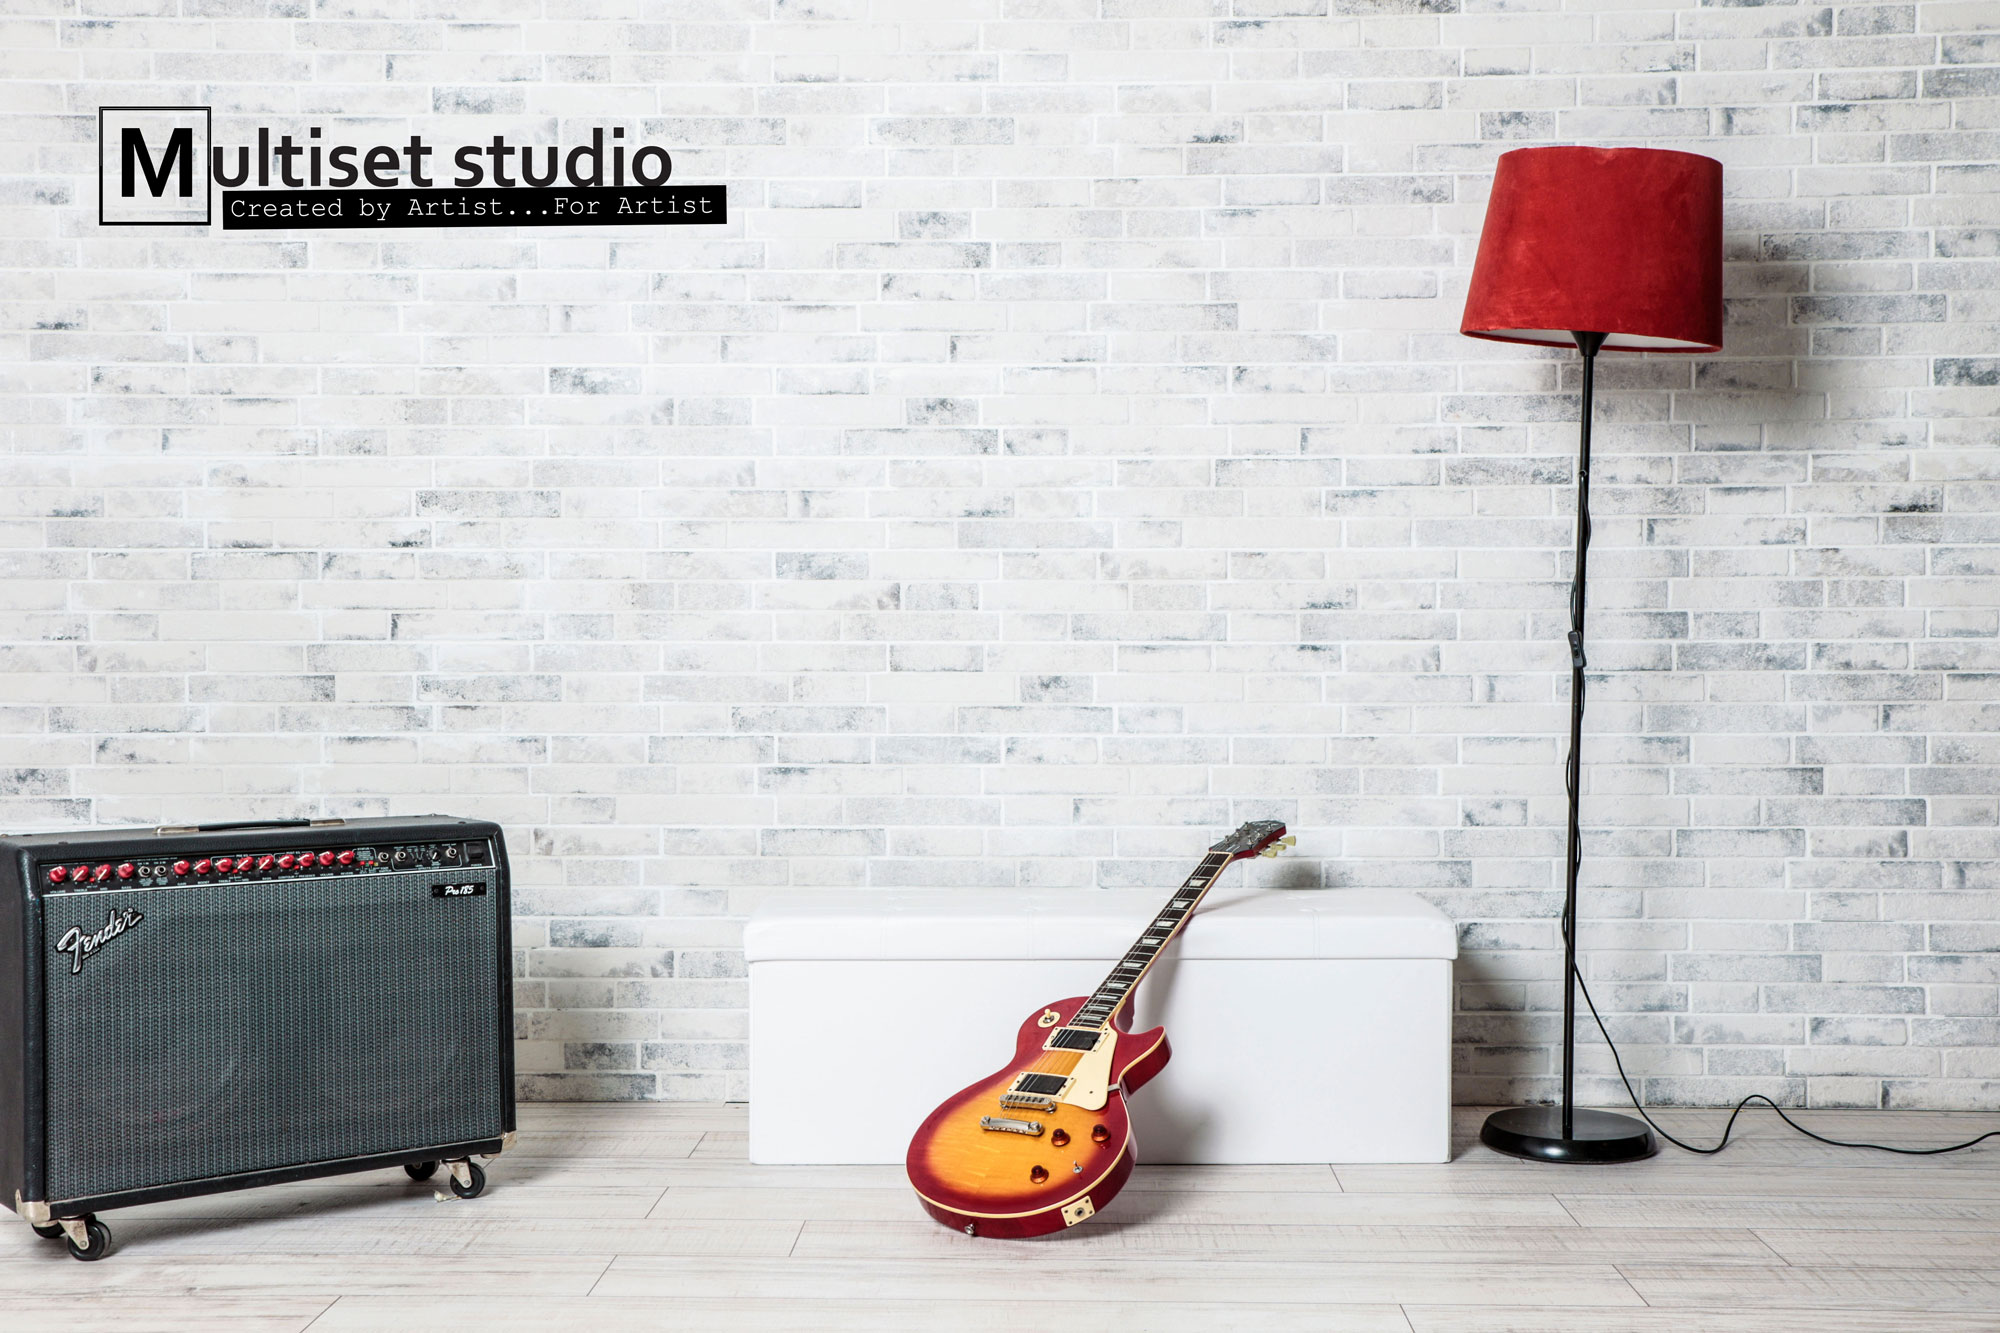 Milano Sala di posa Multiset studio